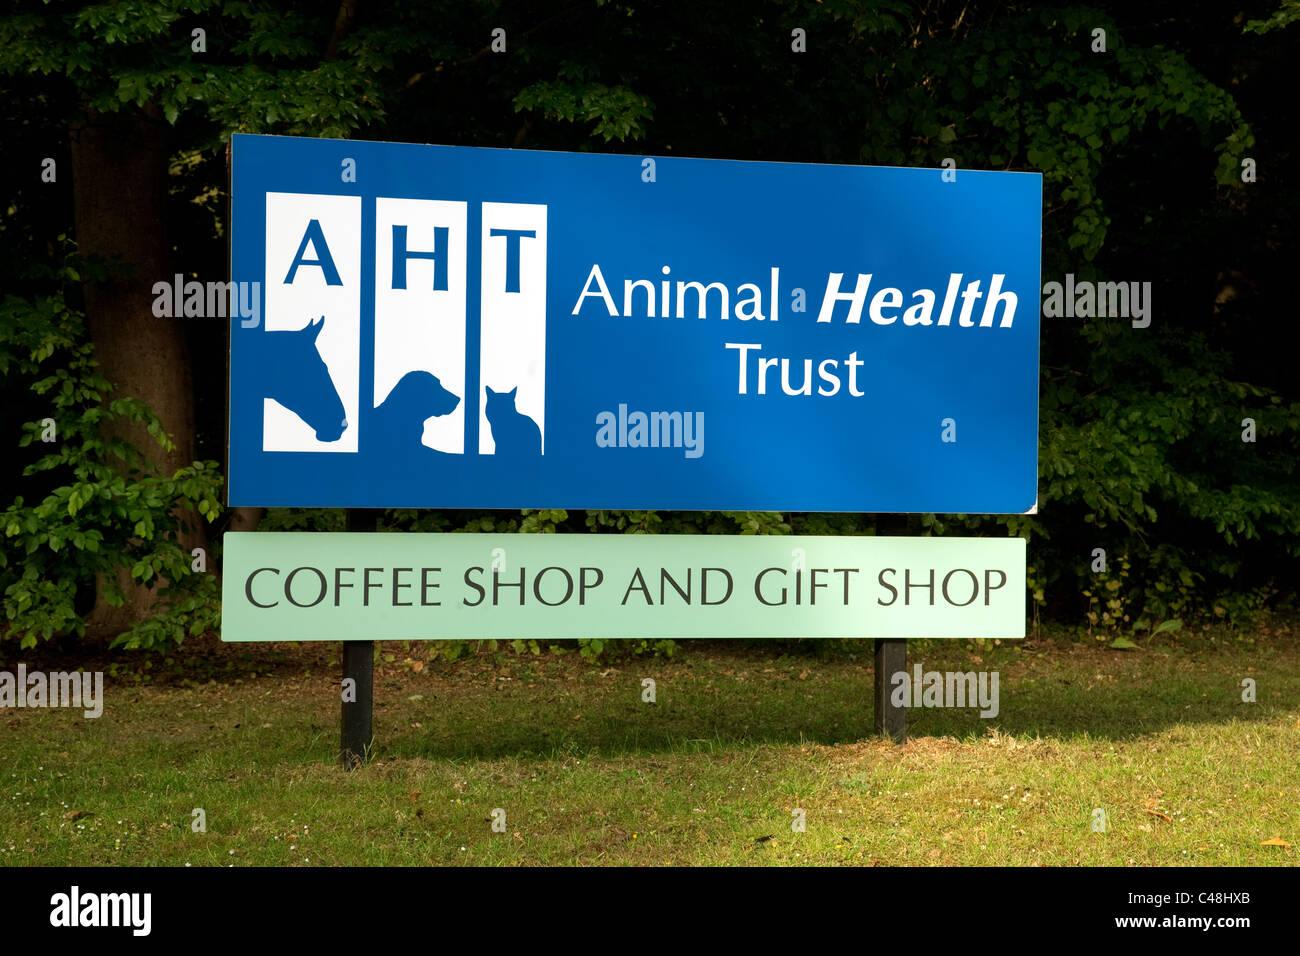 Animal Health trust sign, Kentford, Newmarket Suffolk UK - Stock Image